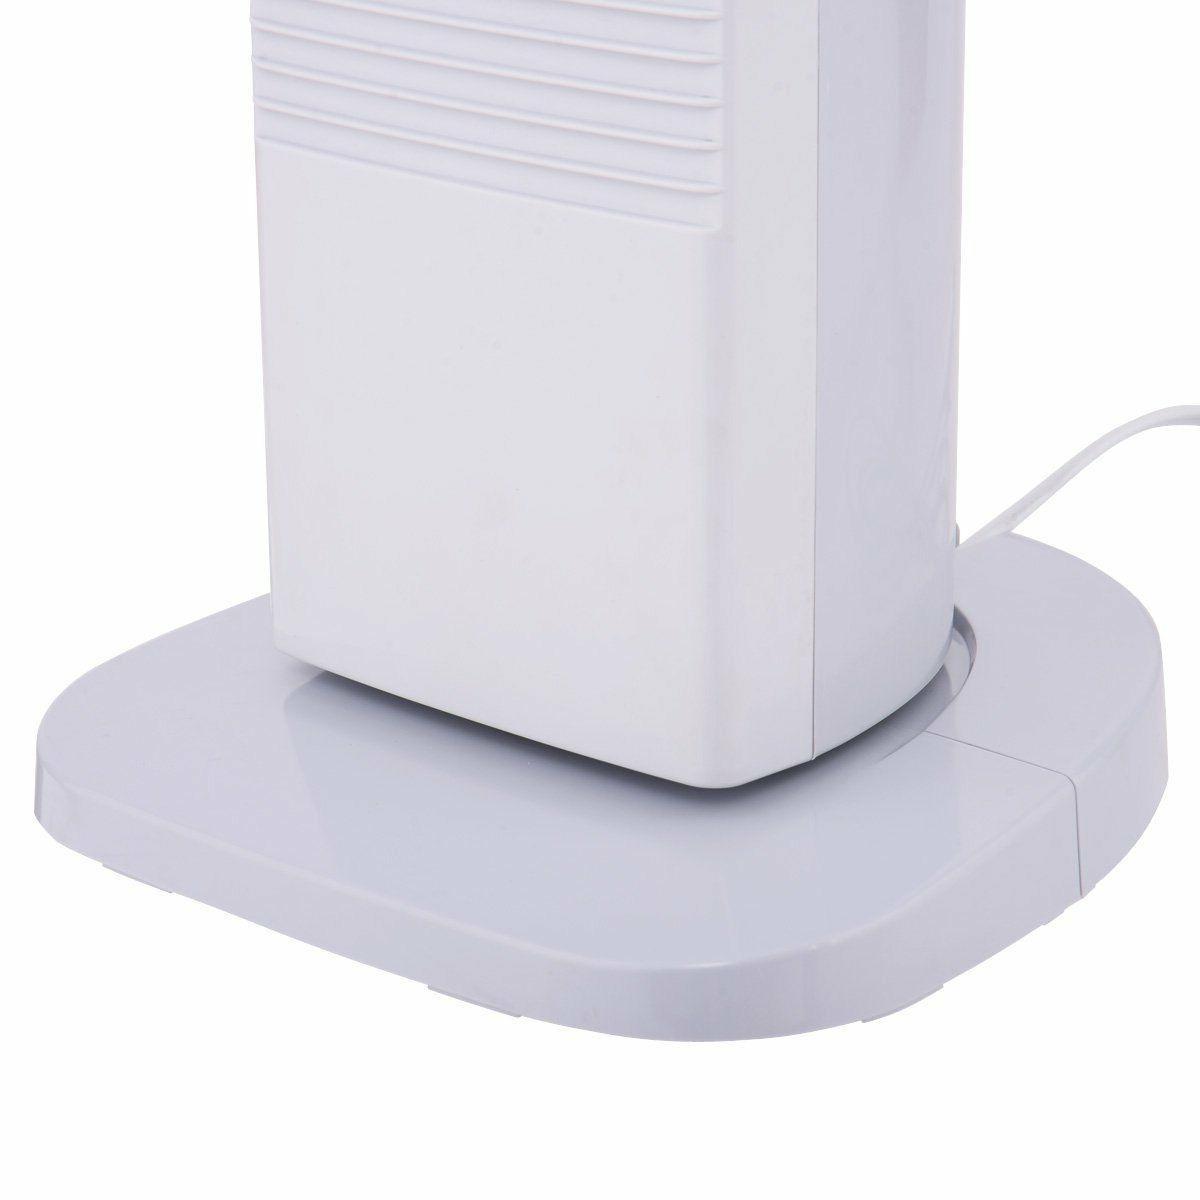 3-Speed Fan Cooling Portable